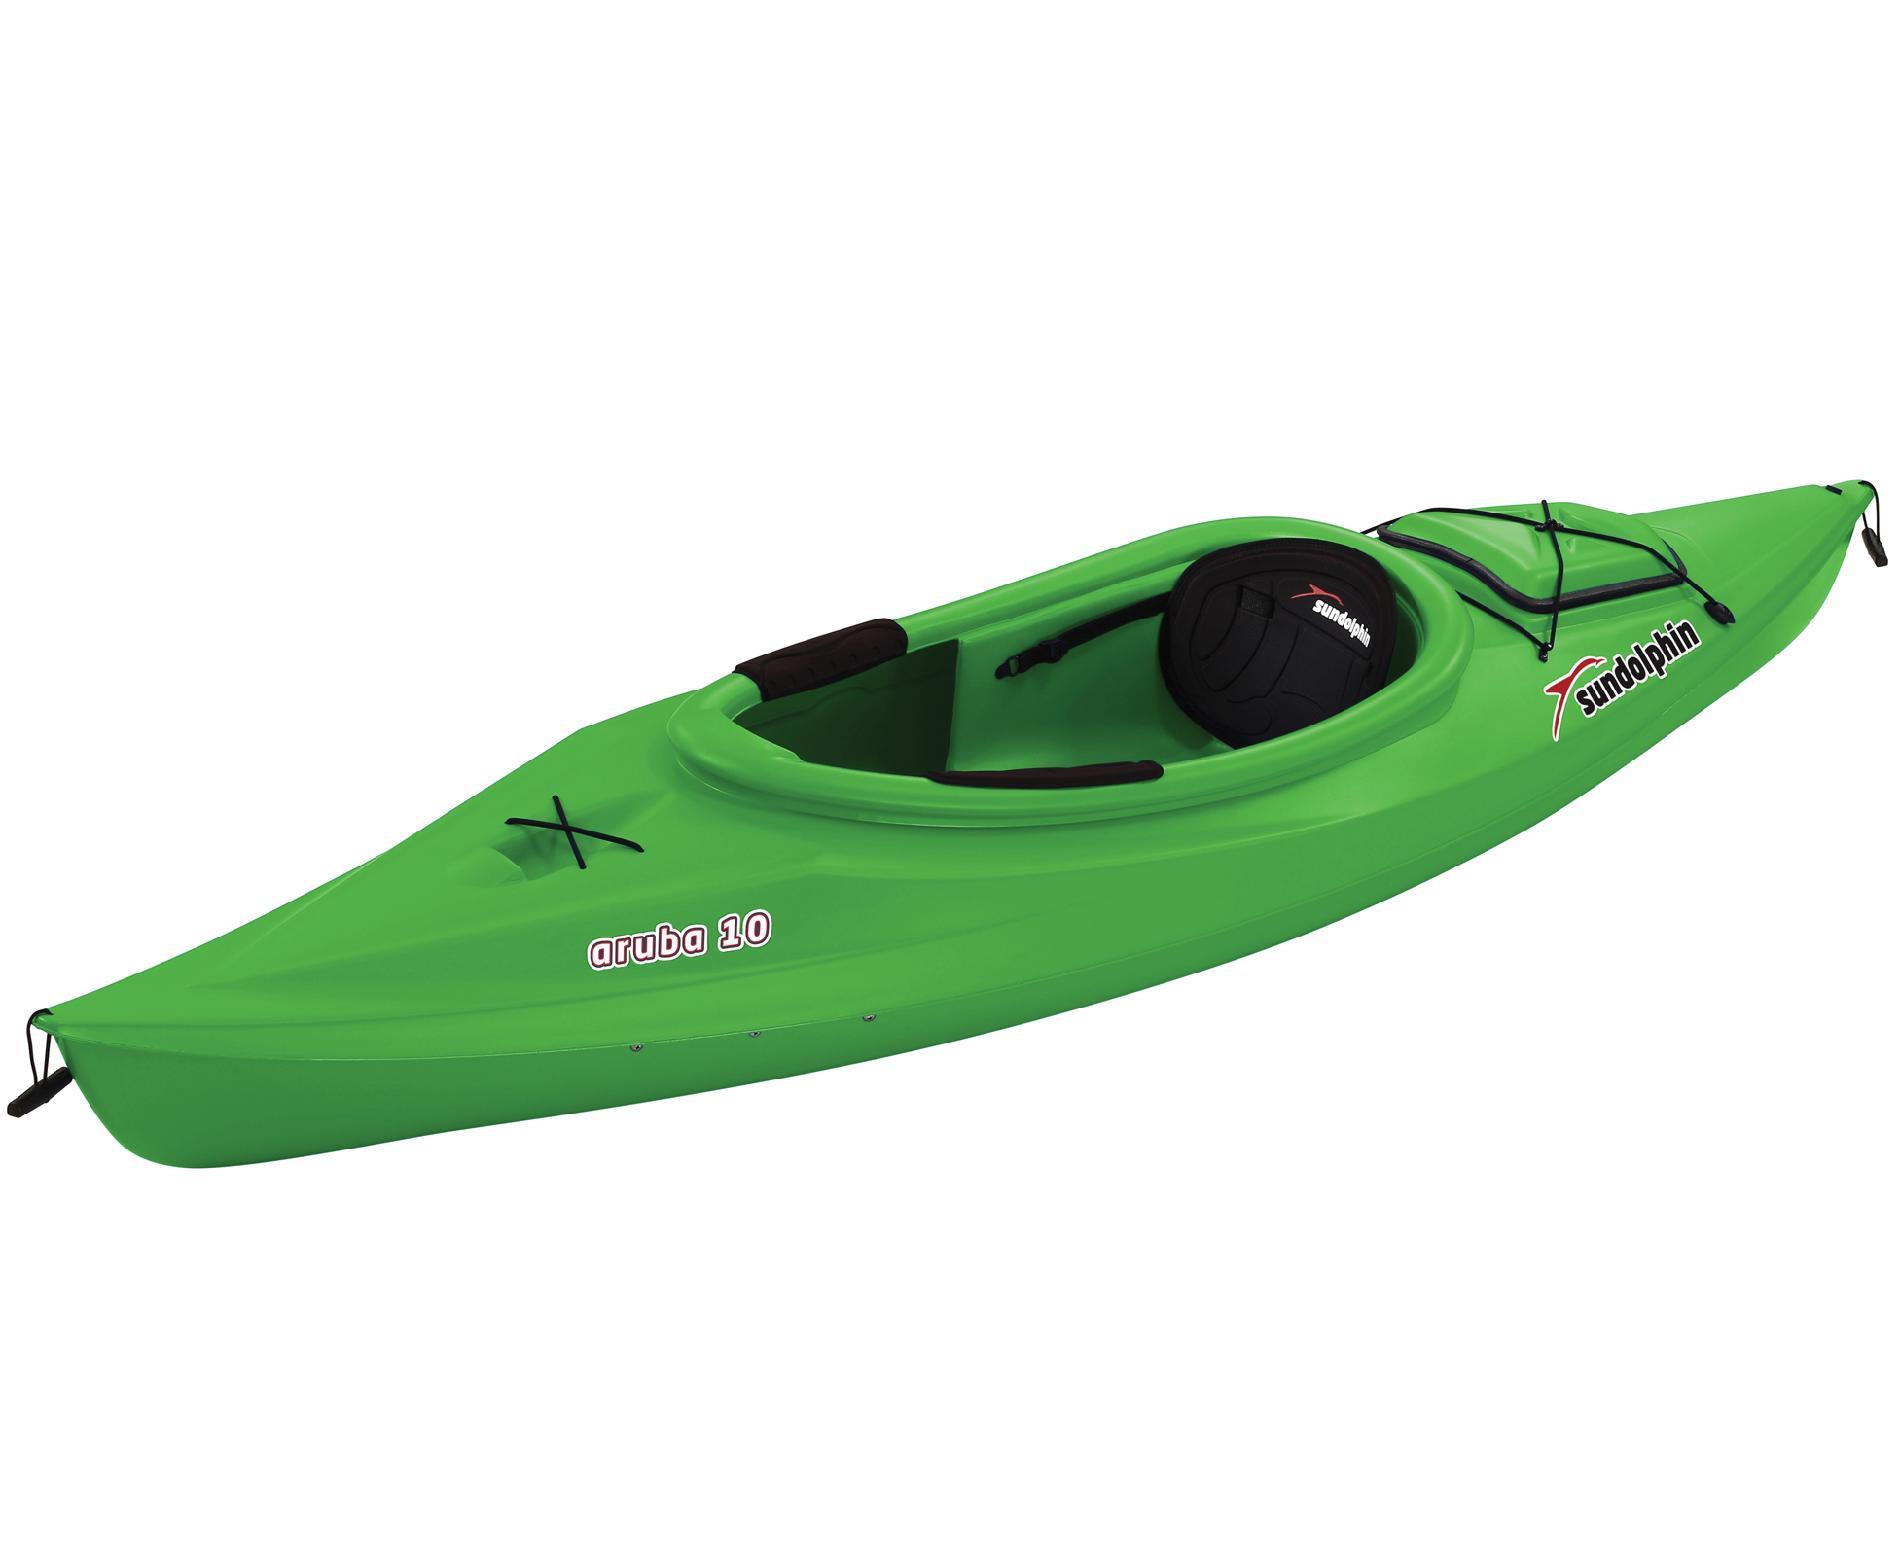 "Sun Dolphin Aruba 10"""" Sit-In Kayak - Green"